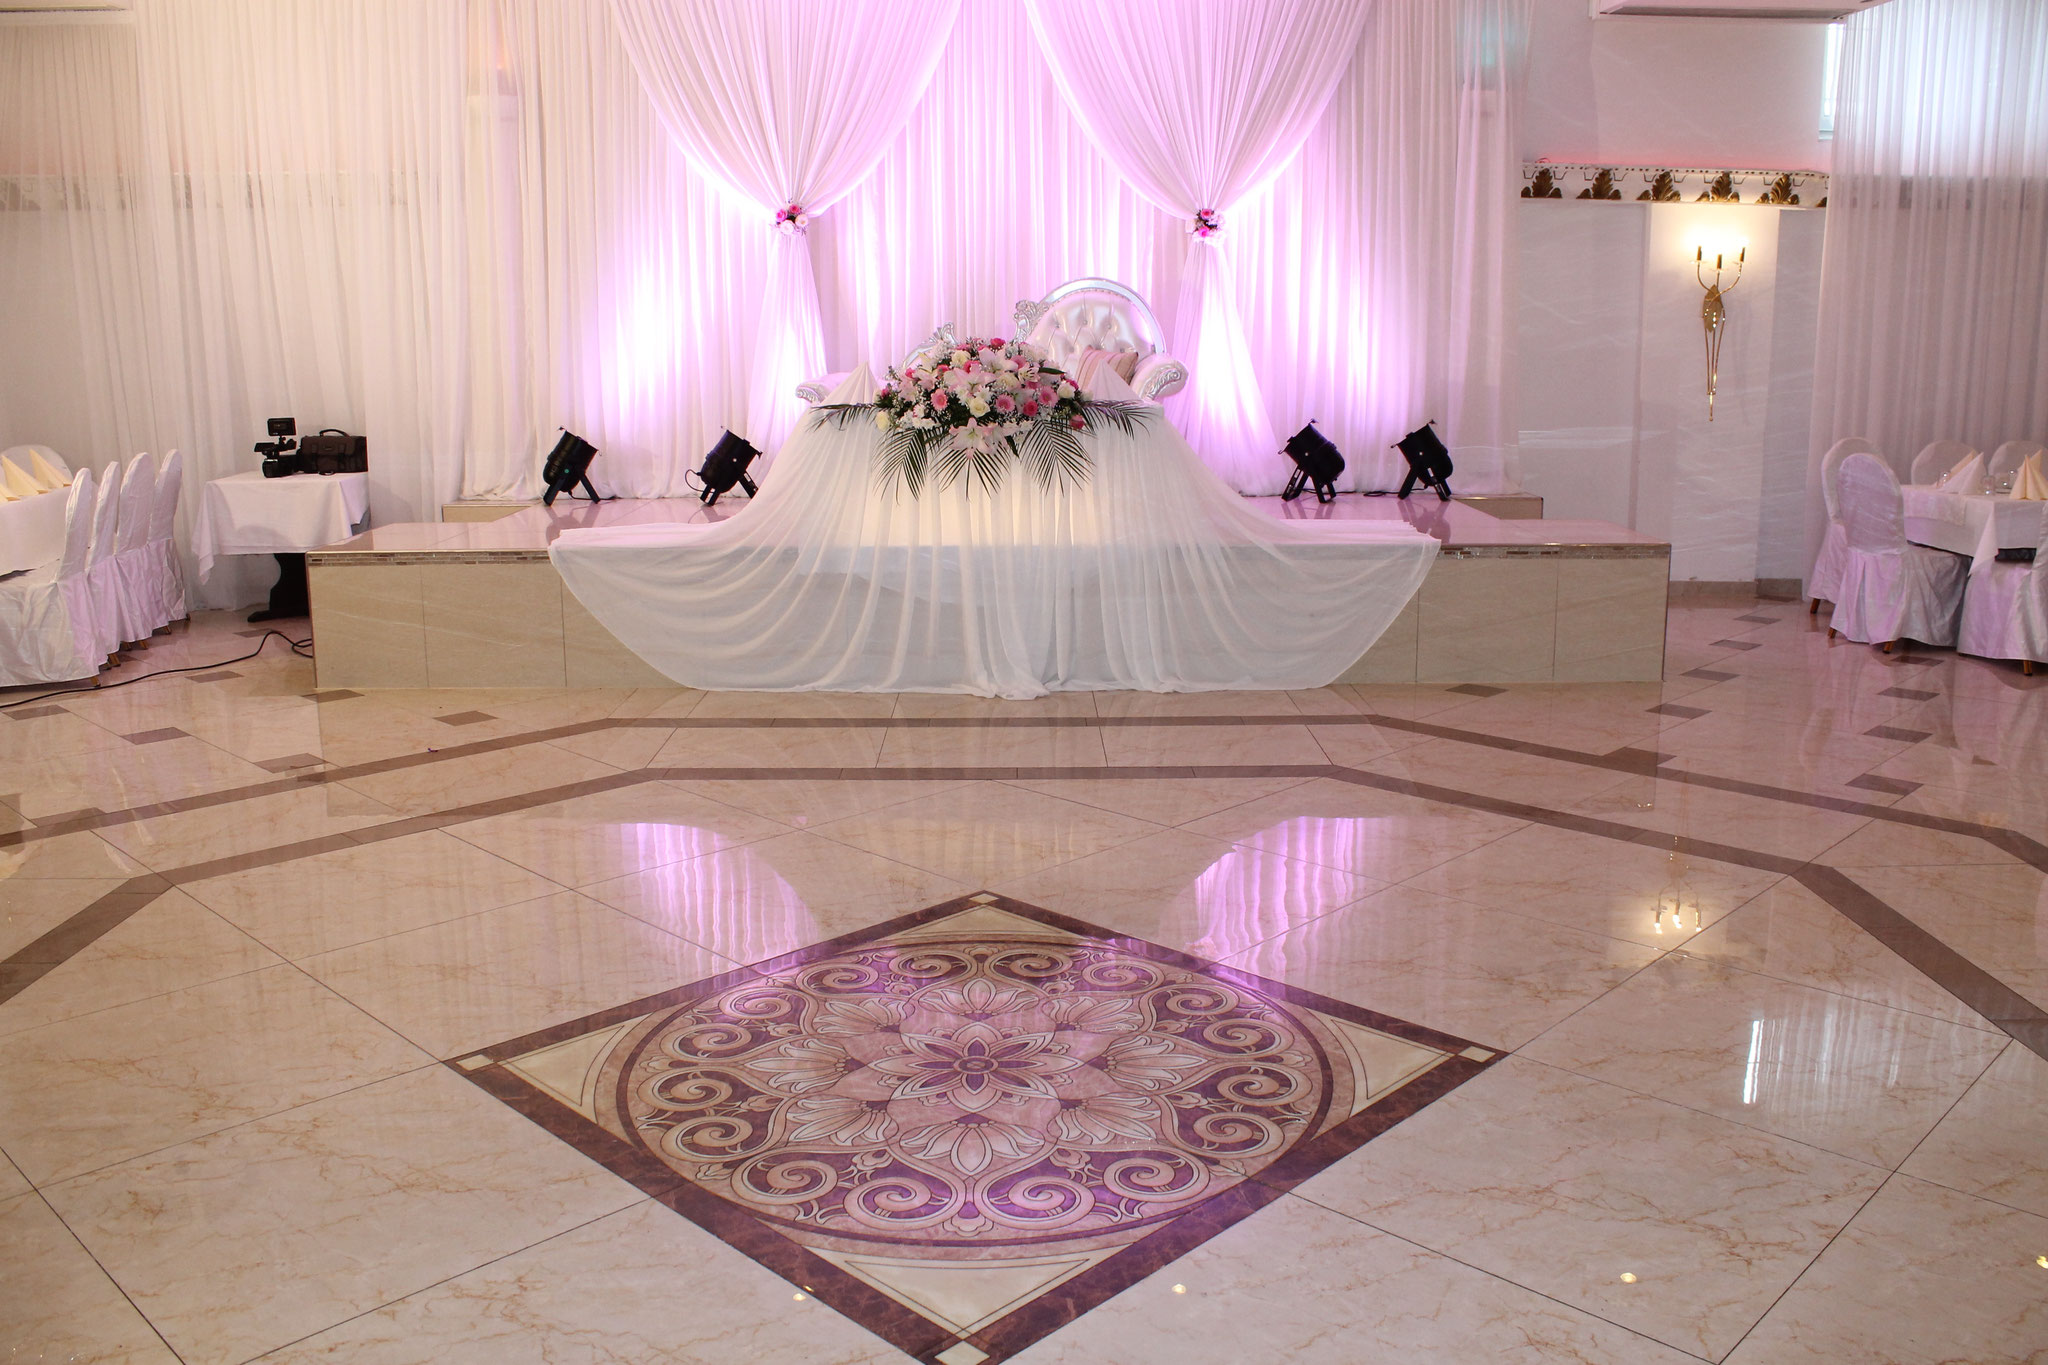 Imperial Ballsaal Festsaal Geretsried Hochzeit Geburtstag